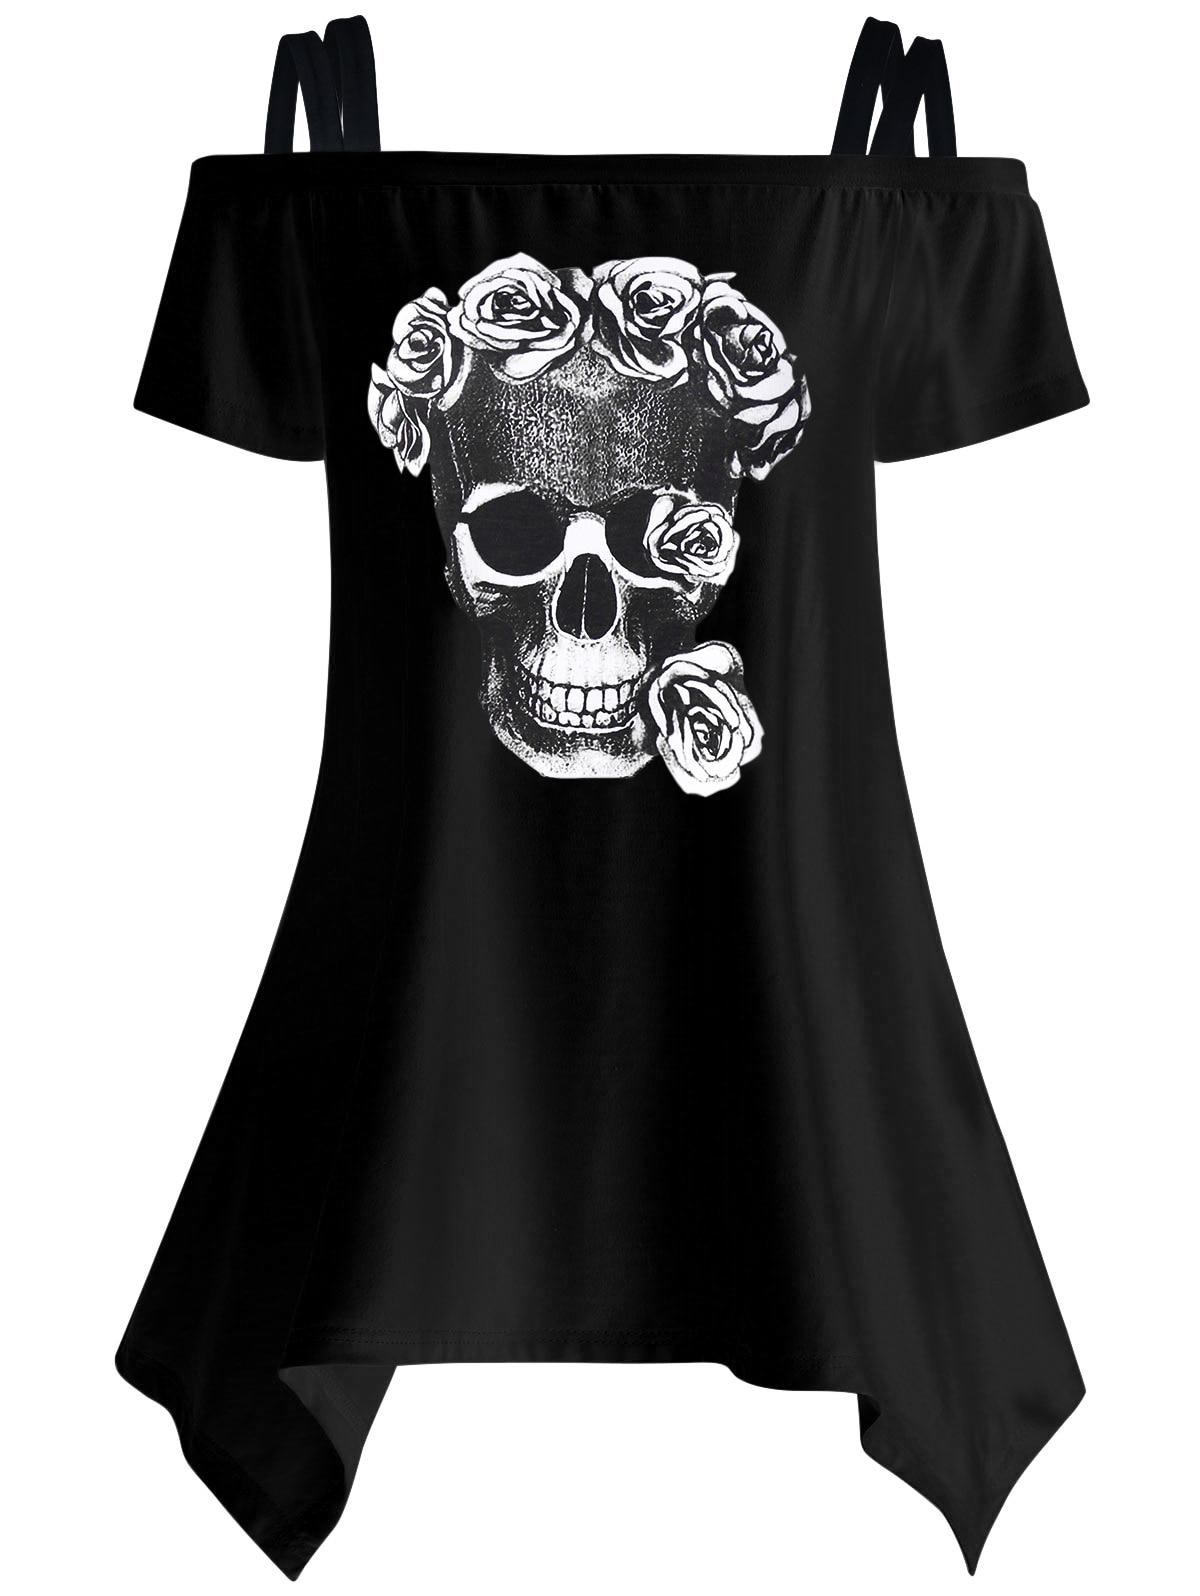 Mujeres Casual manga corta Camisetas Skull imprimir camisetas femeninas del hombro 2017 verano túnica Mujer Tops LJ9615E